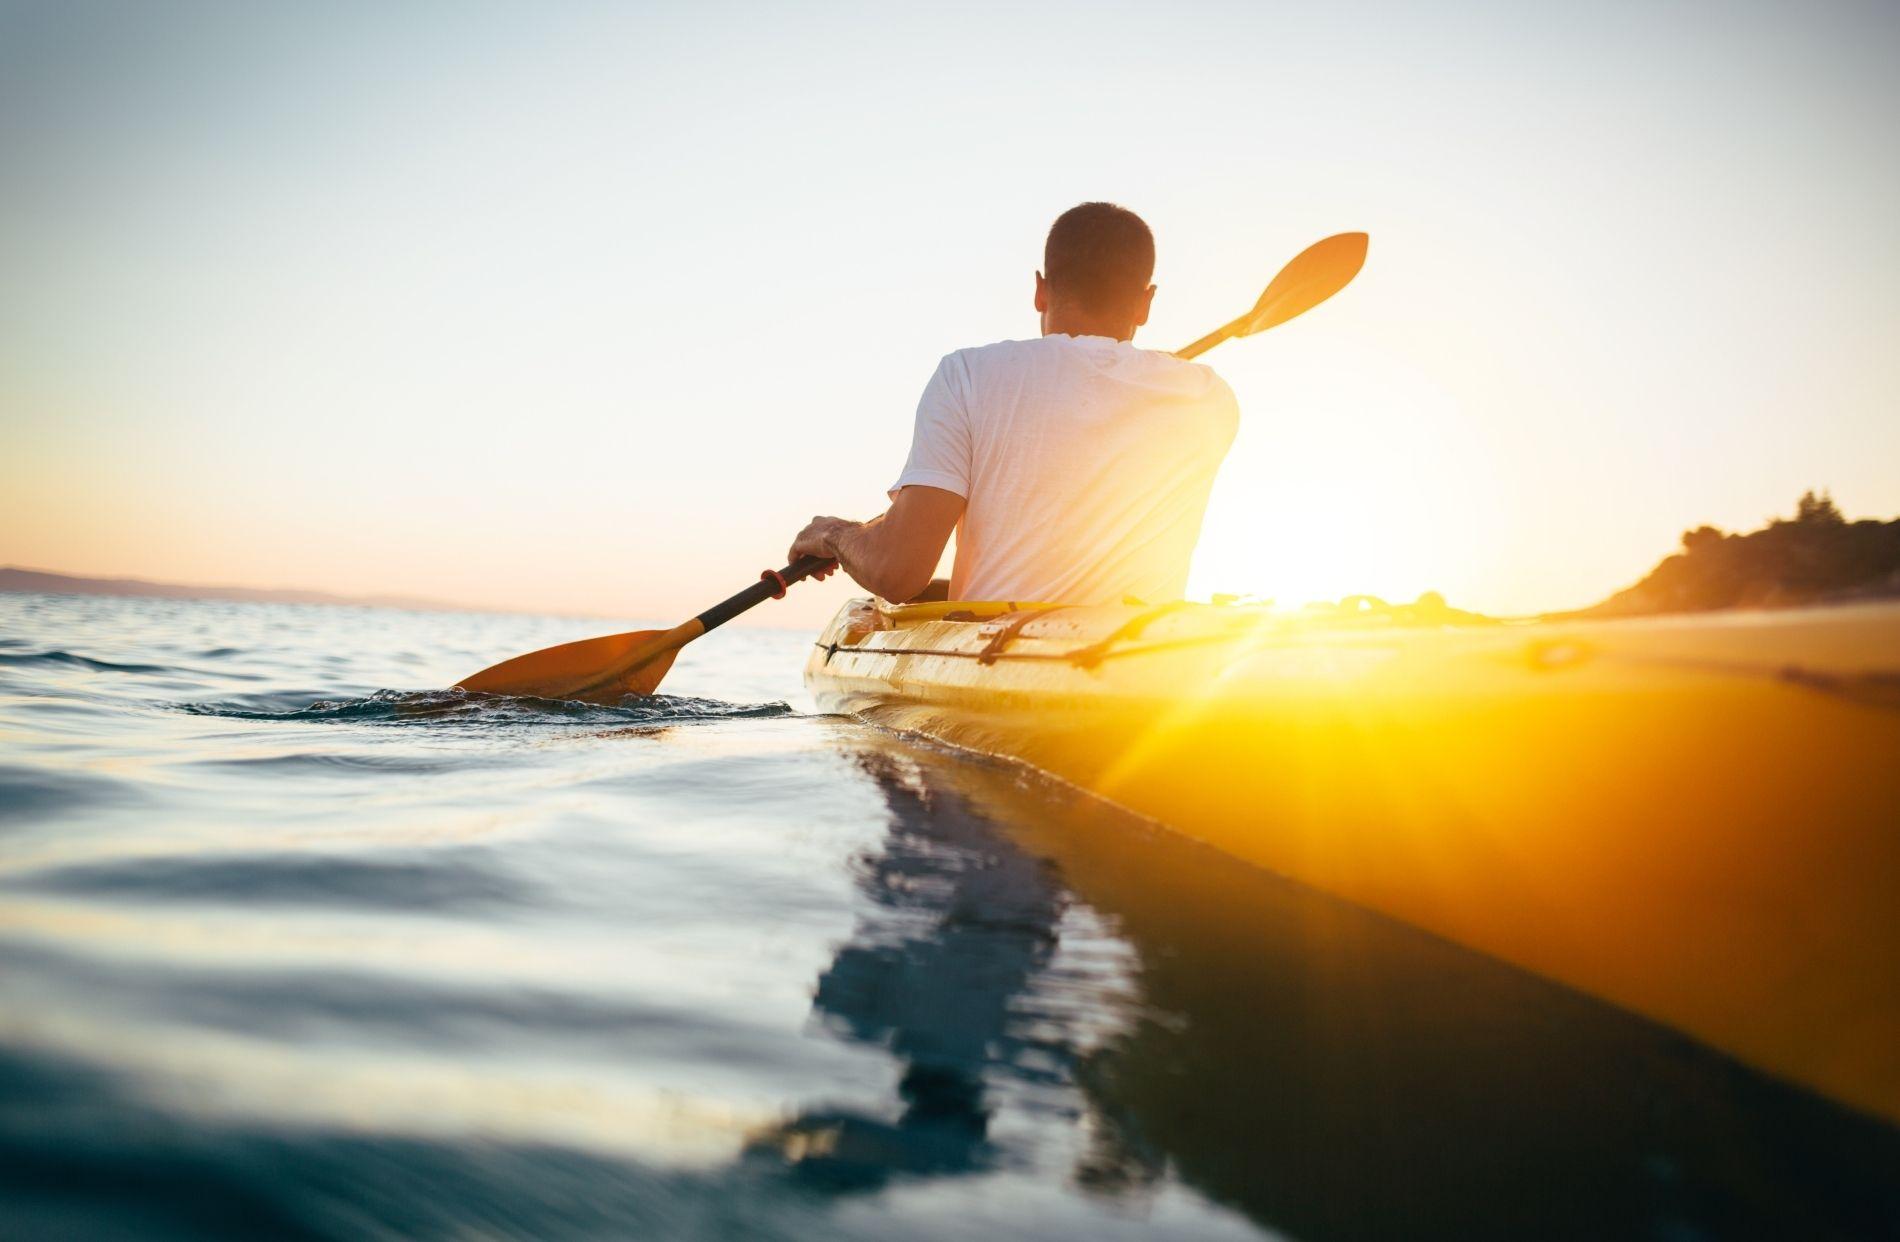 Man in white t-shirt paddling a yellow kayak as the sun sets